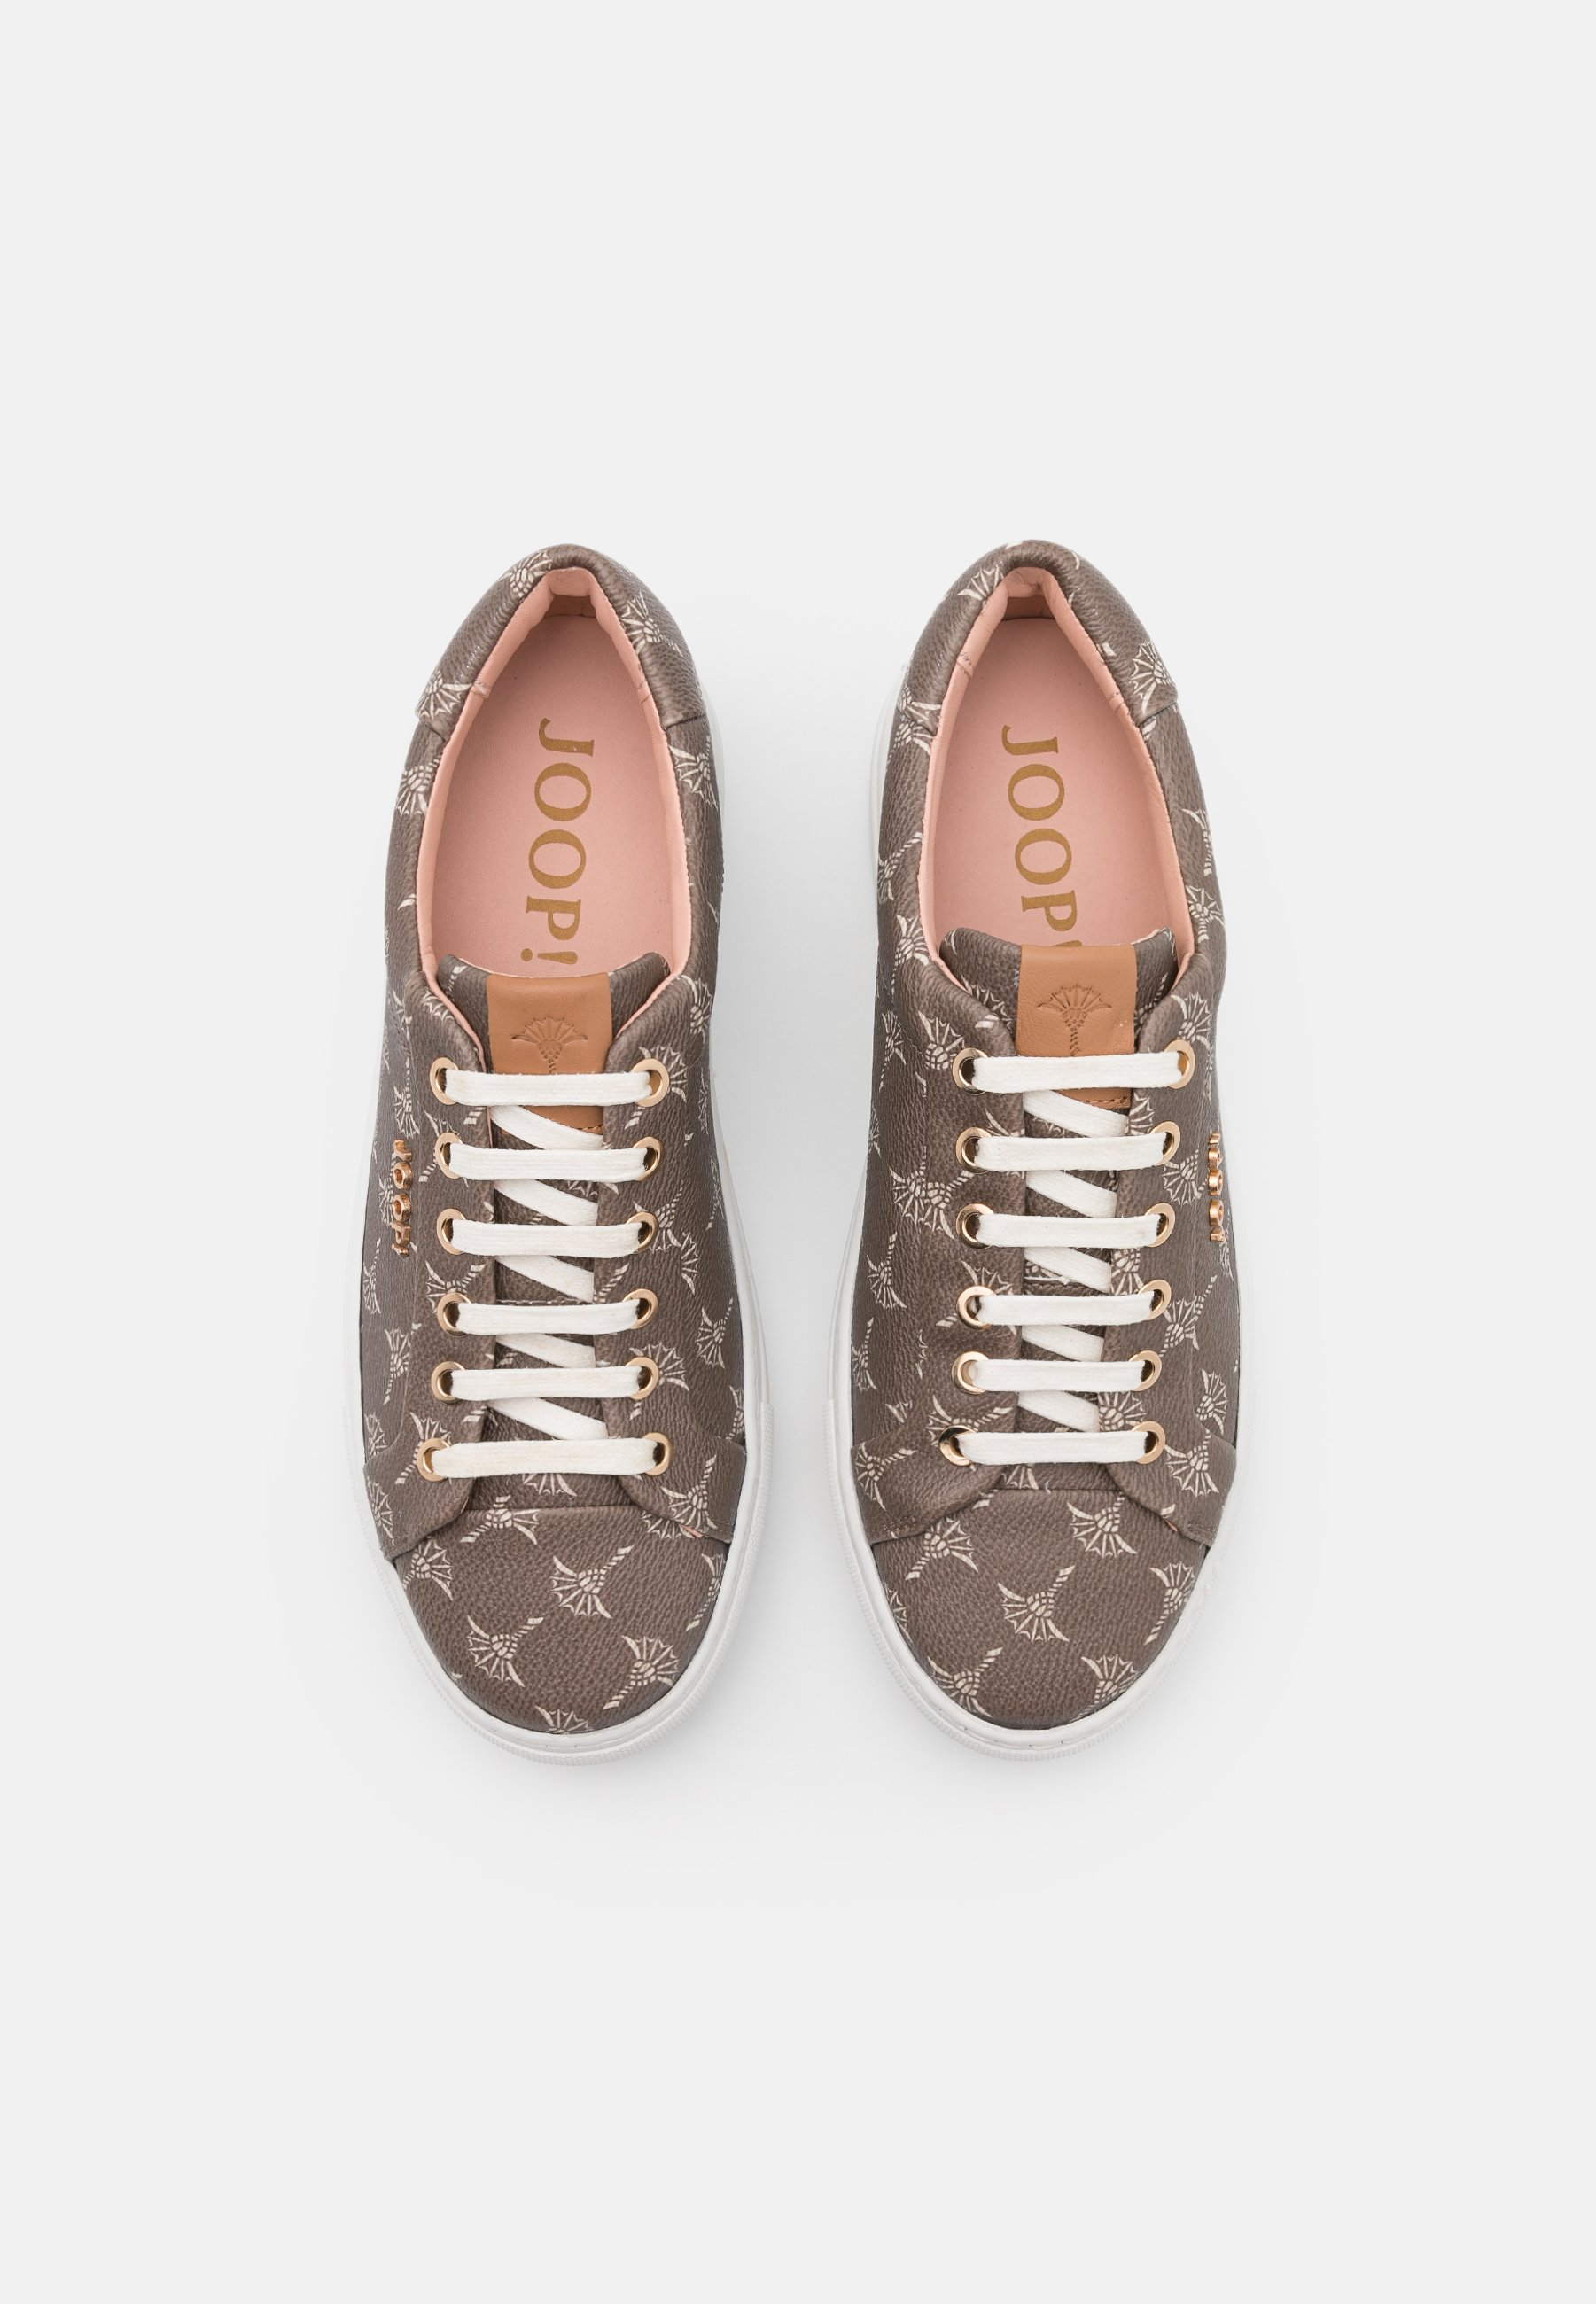 JOOP! CORTINA DAPHNE Sneaker low mud/taupe